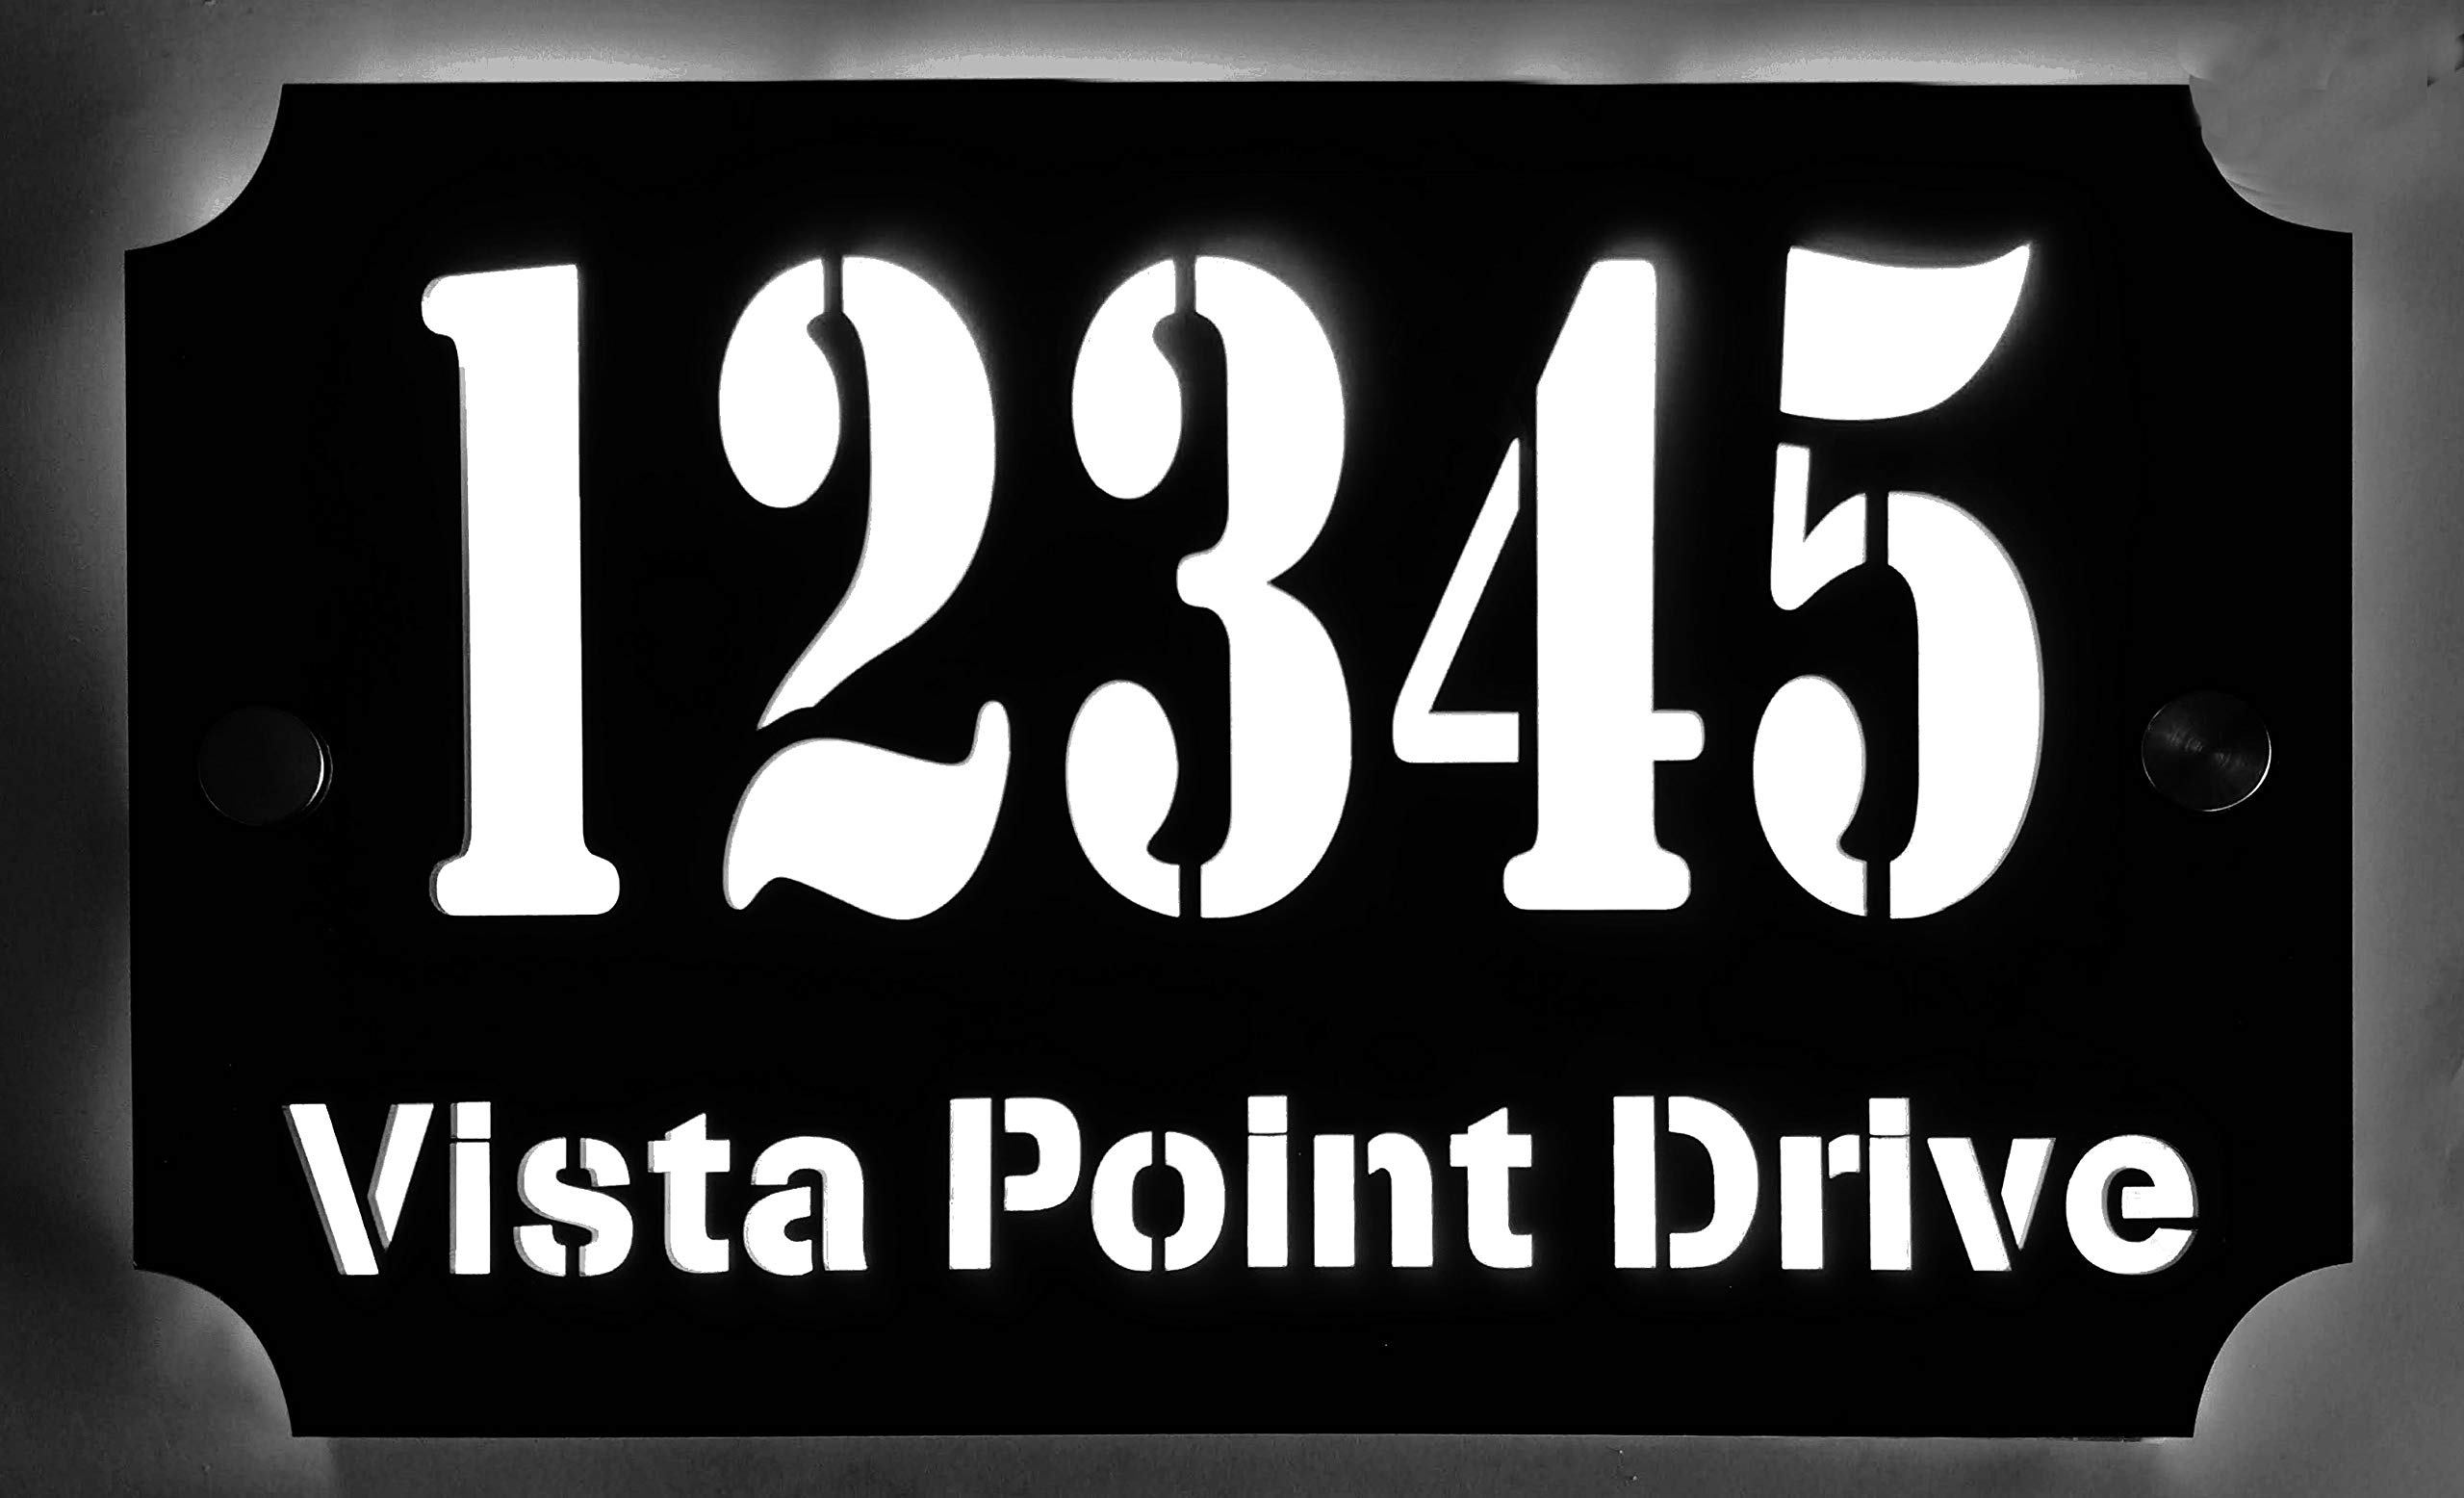 Custom House Address Plaque, LED Illuminated Laser Engraved Acrylic Double Plates Sign, Premium Quality, Stylish and Durable (11''x7'' Rectange, White LED) by THEDISPLAYDEAL